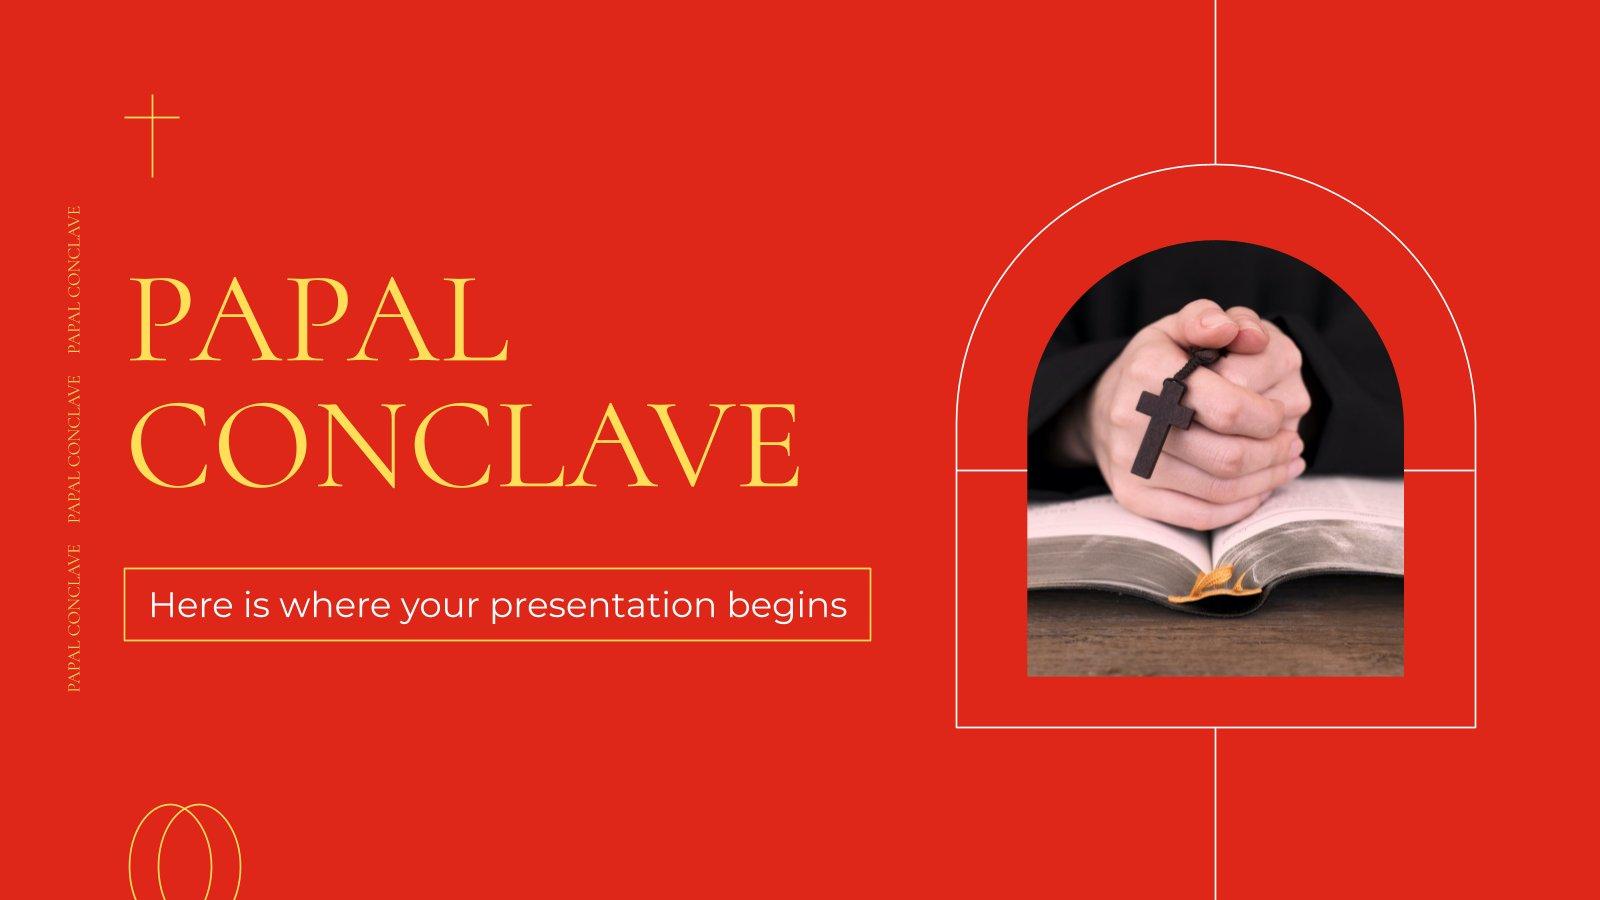 Papal Conclave presentation template